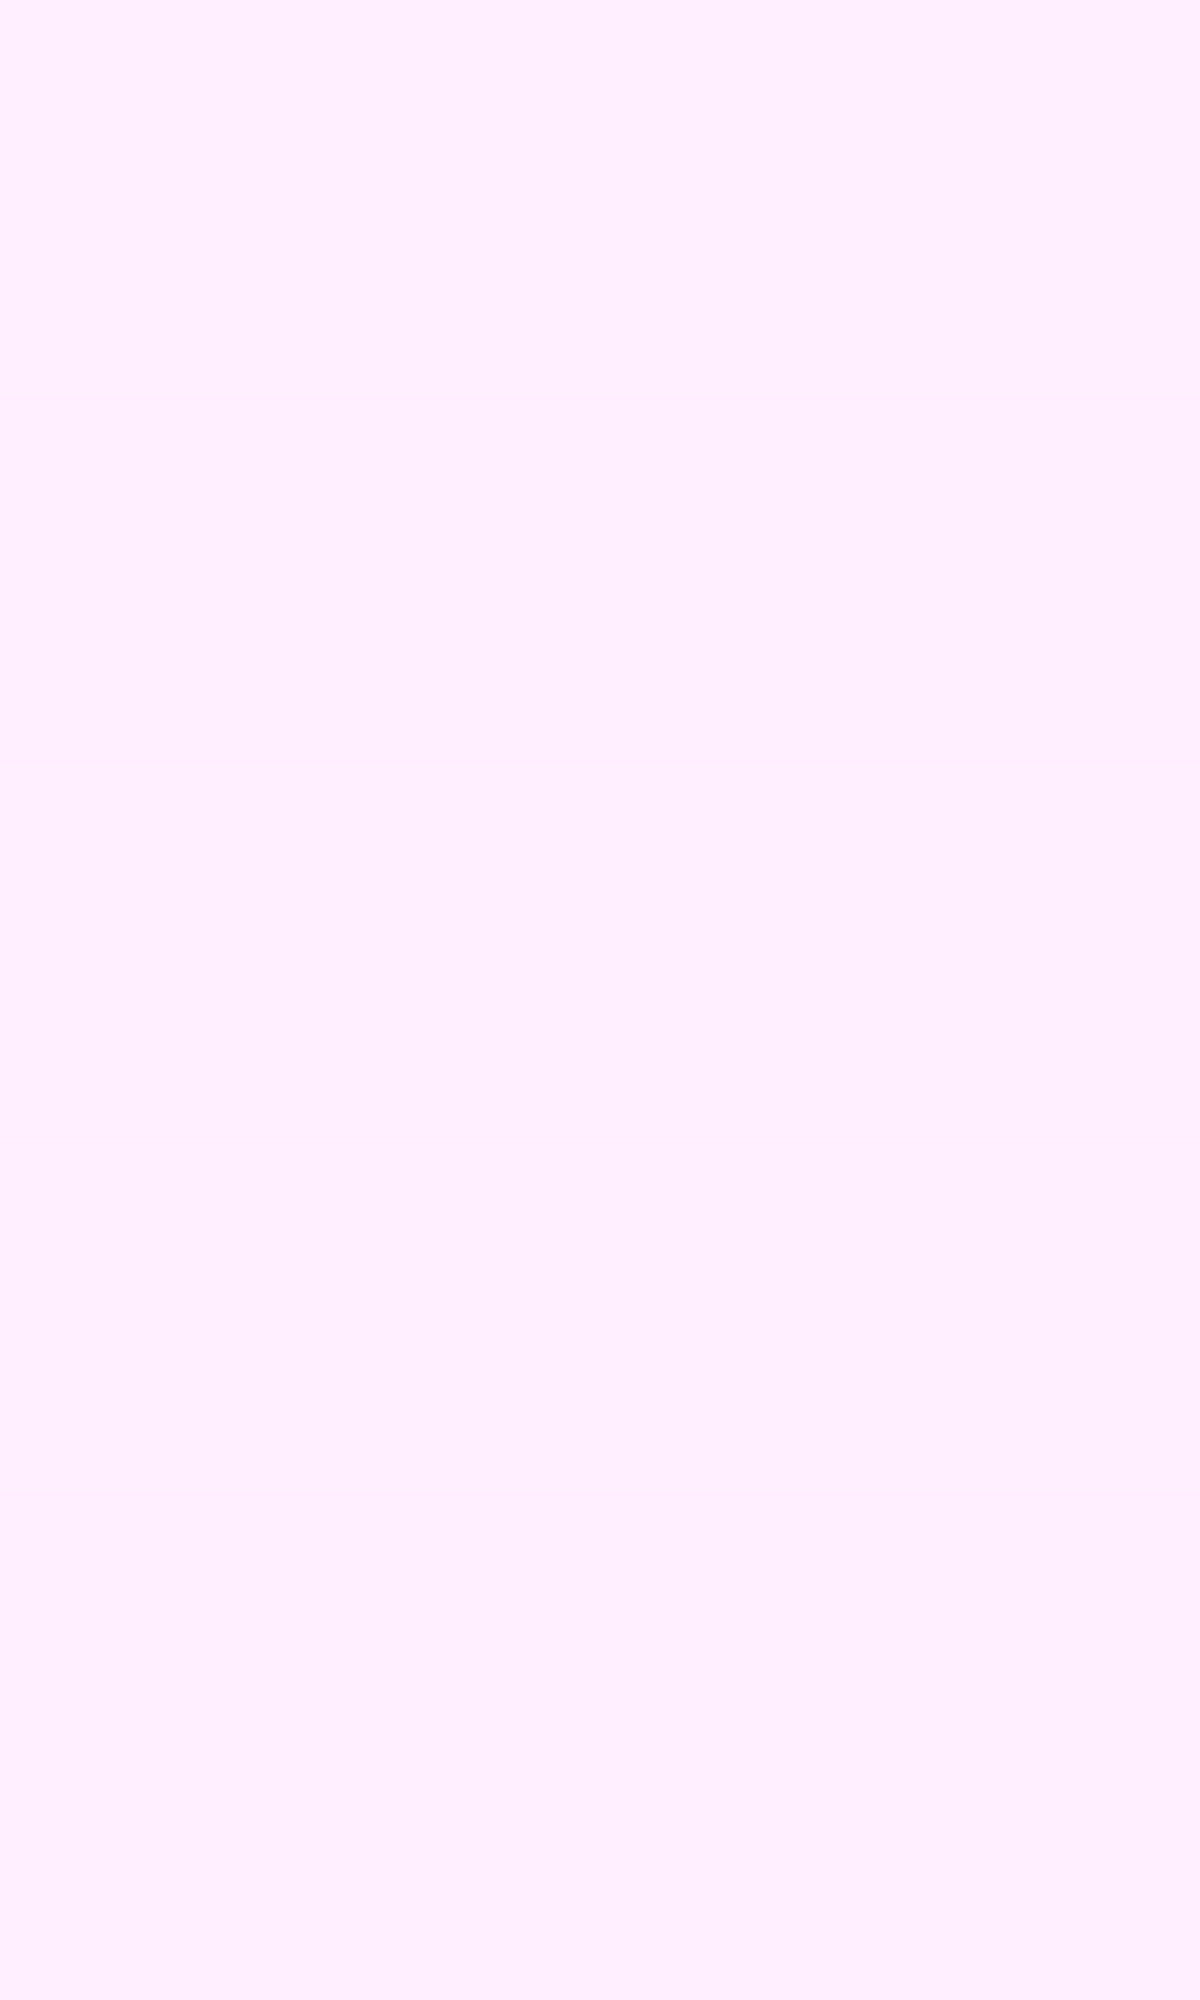 [Hisasi] Shoujo no Toge ~No girl without a thorn~ [English][Digital] + 8P Shousasshi 4